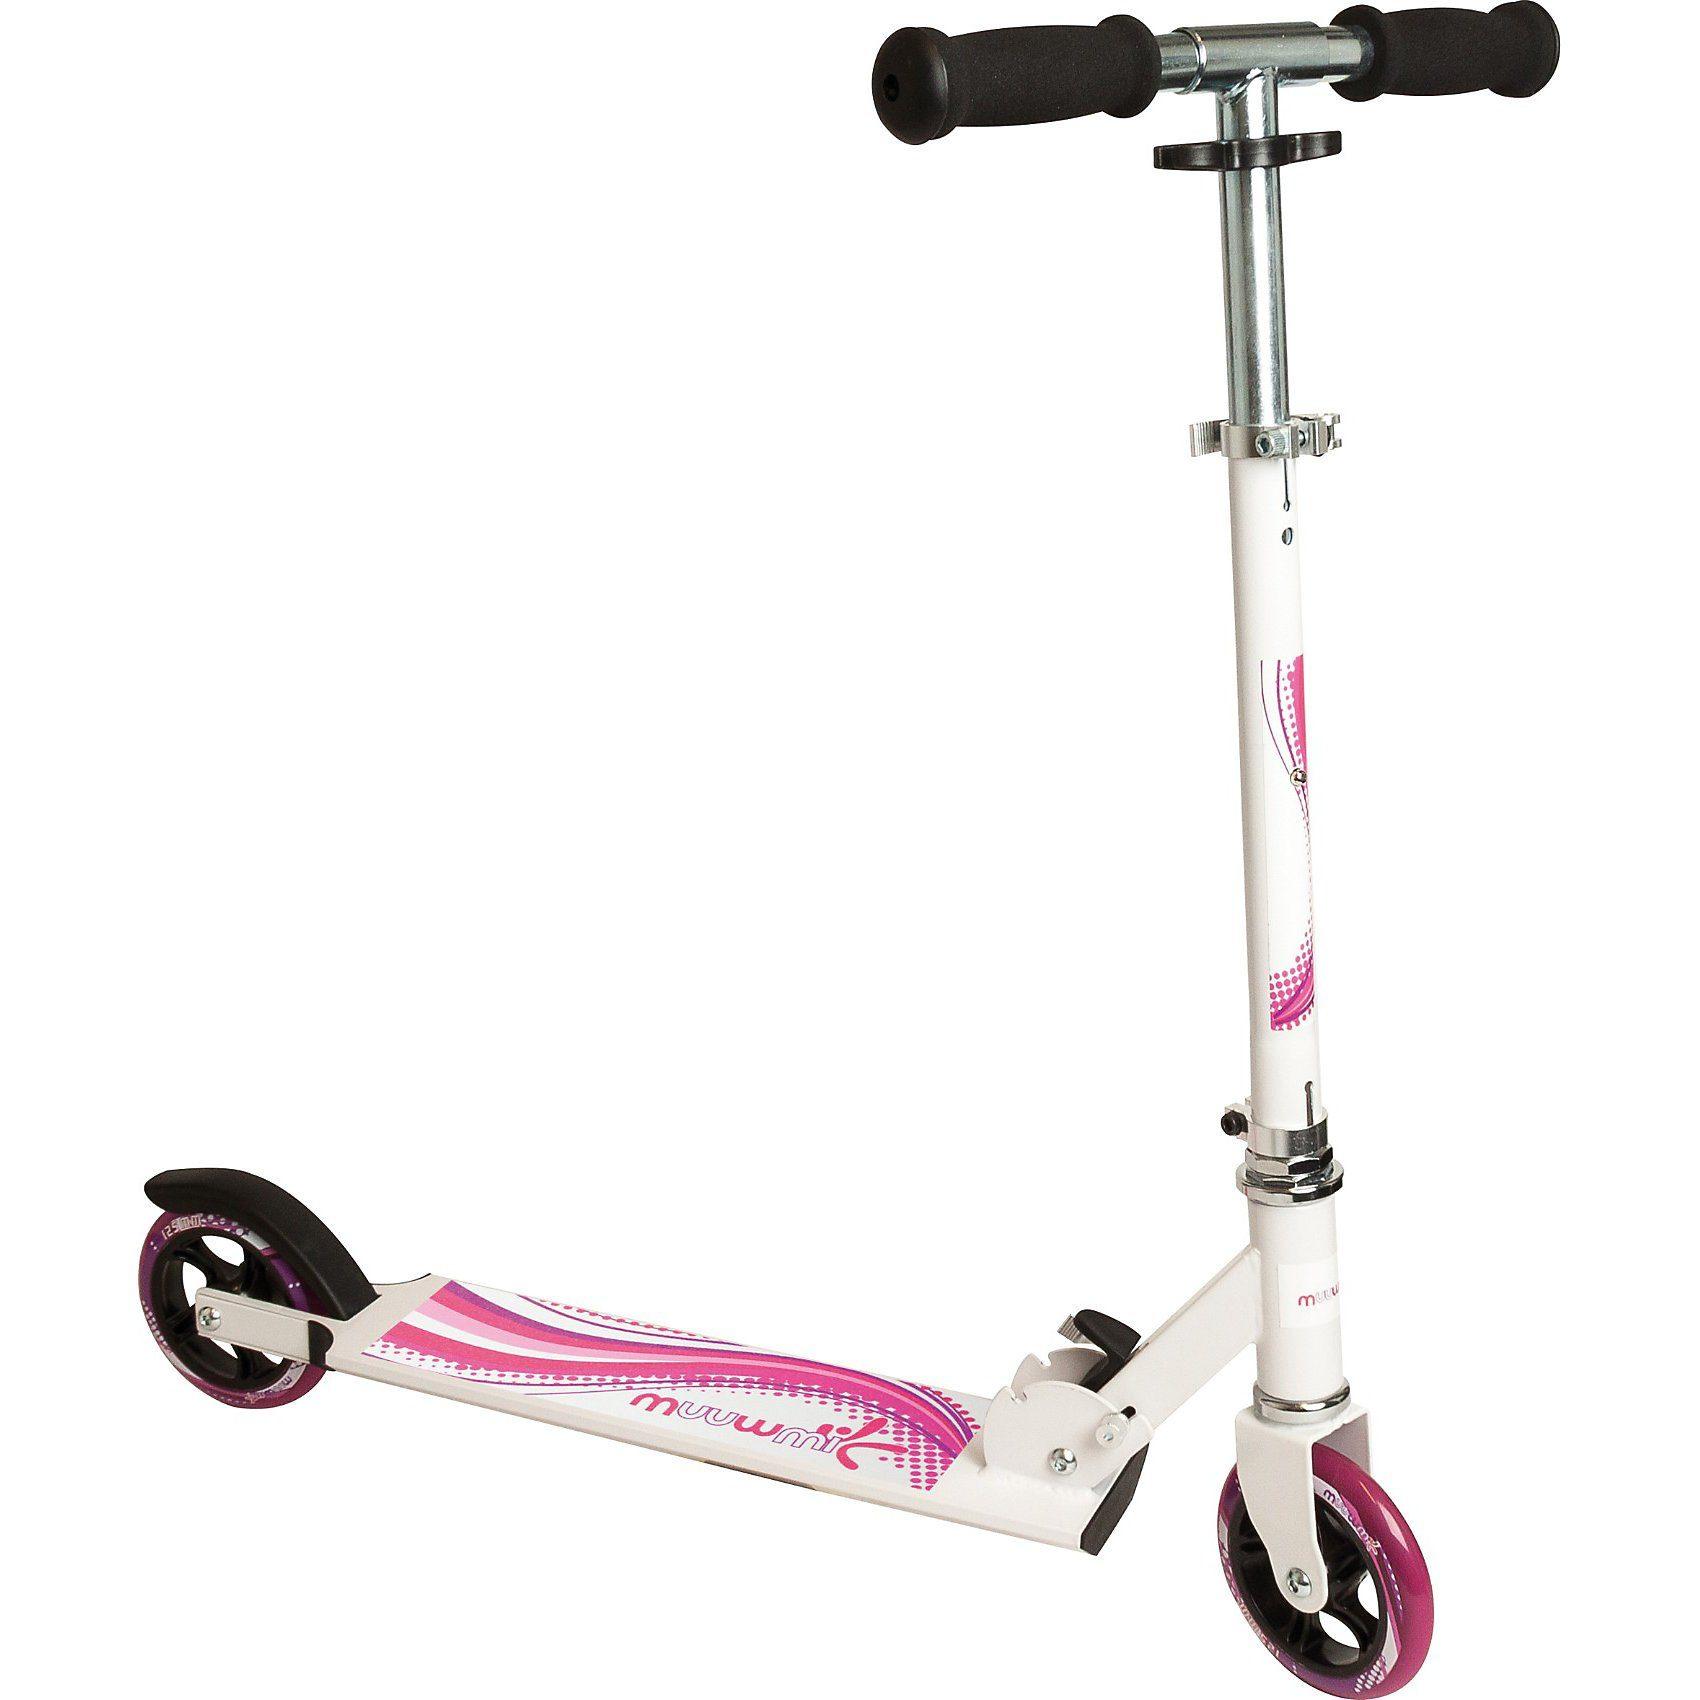 Muuwmi Scooter weiß/Pink 125 mm